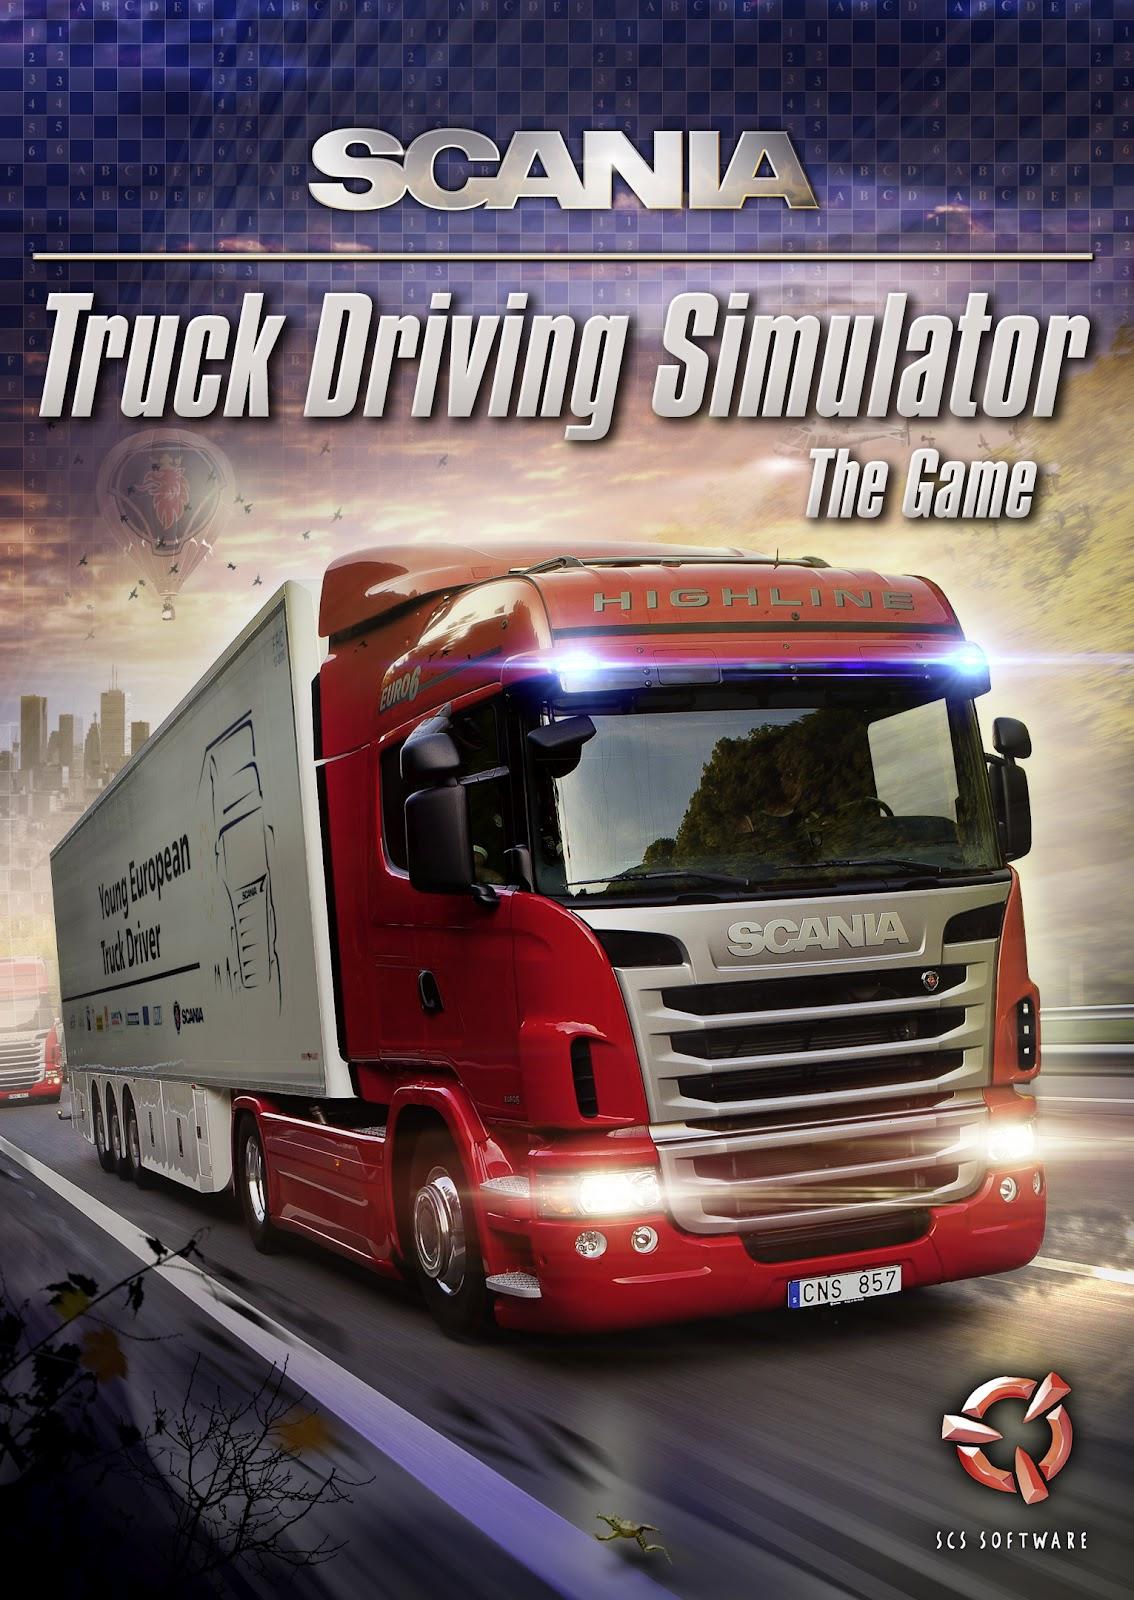 Scania truck driving simulator download & key youtube.